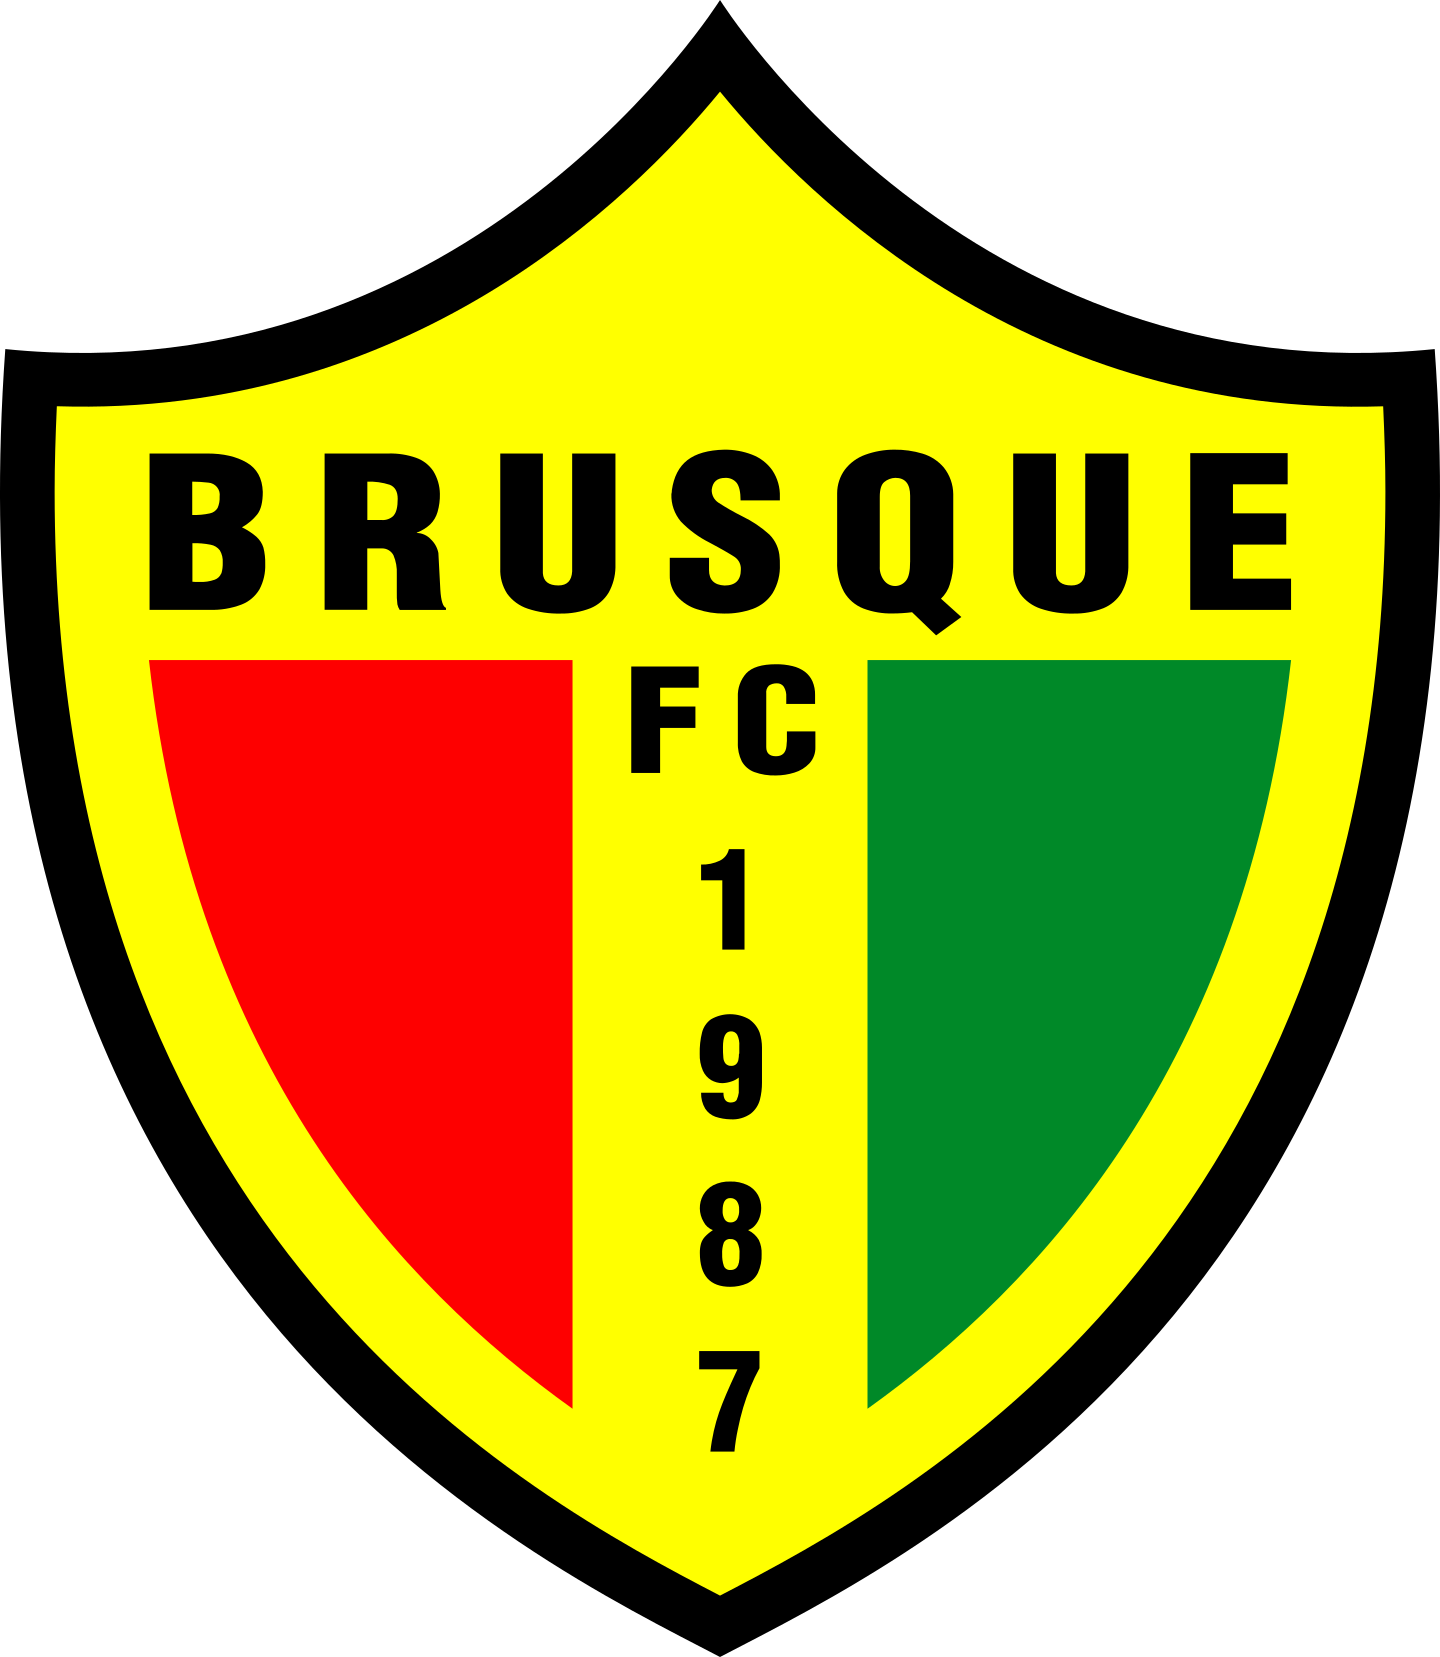 brusque fc logo 3 - Brusque FC Logo (Brazil)